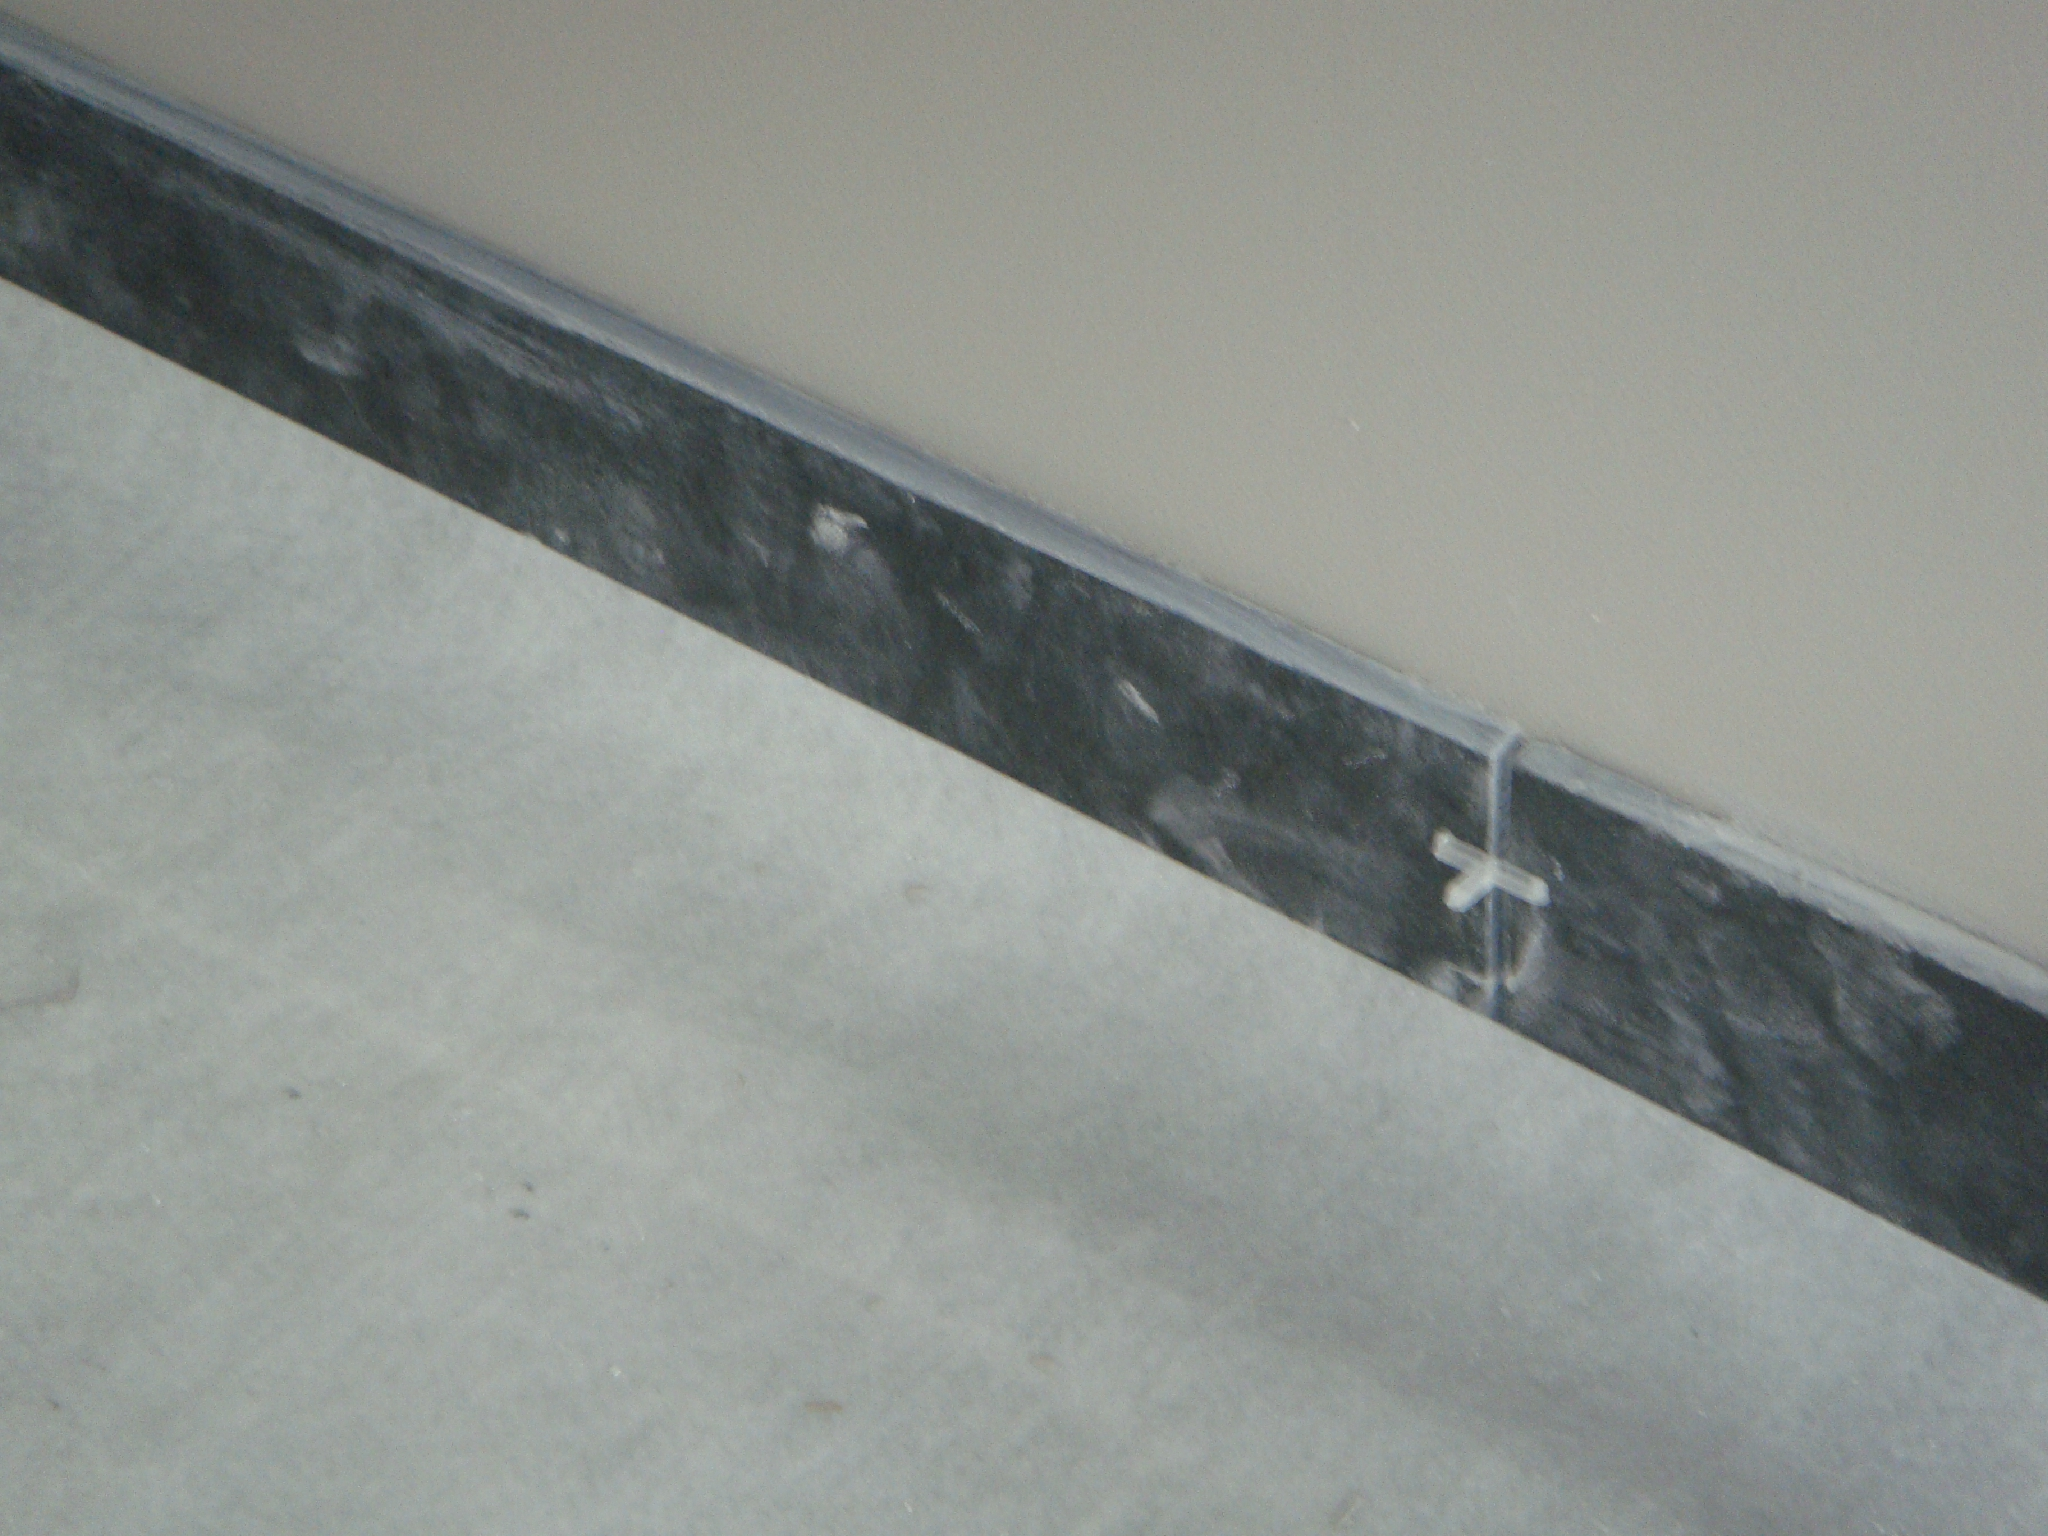 plinthes salle de bain renovation plinthe carrelage. Black Bedroom Furniture Sets. Home Design Ideas